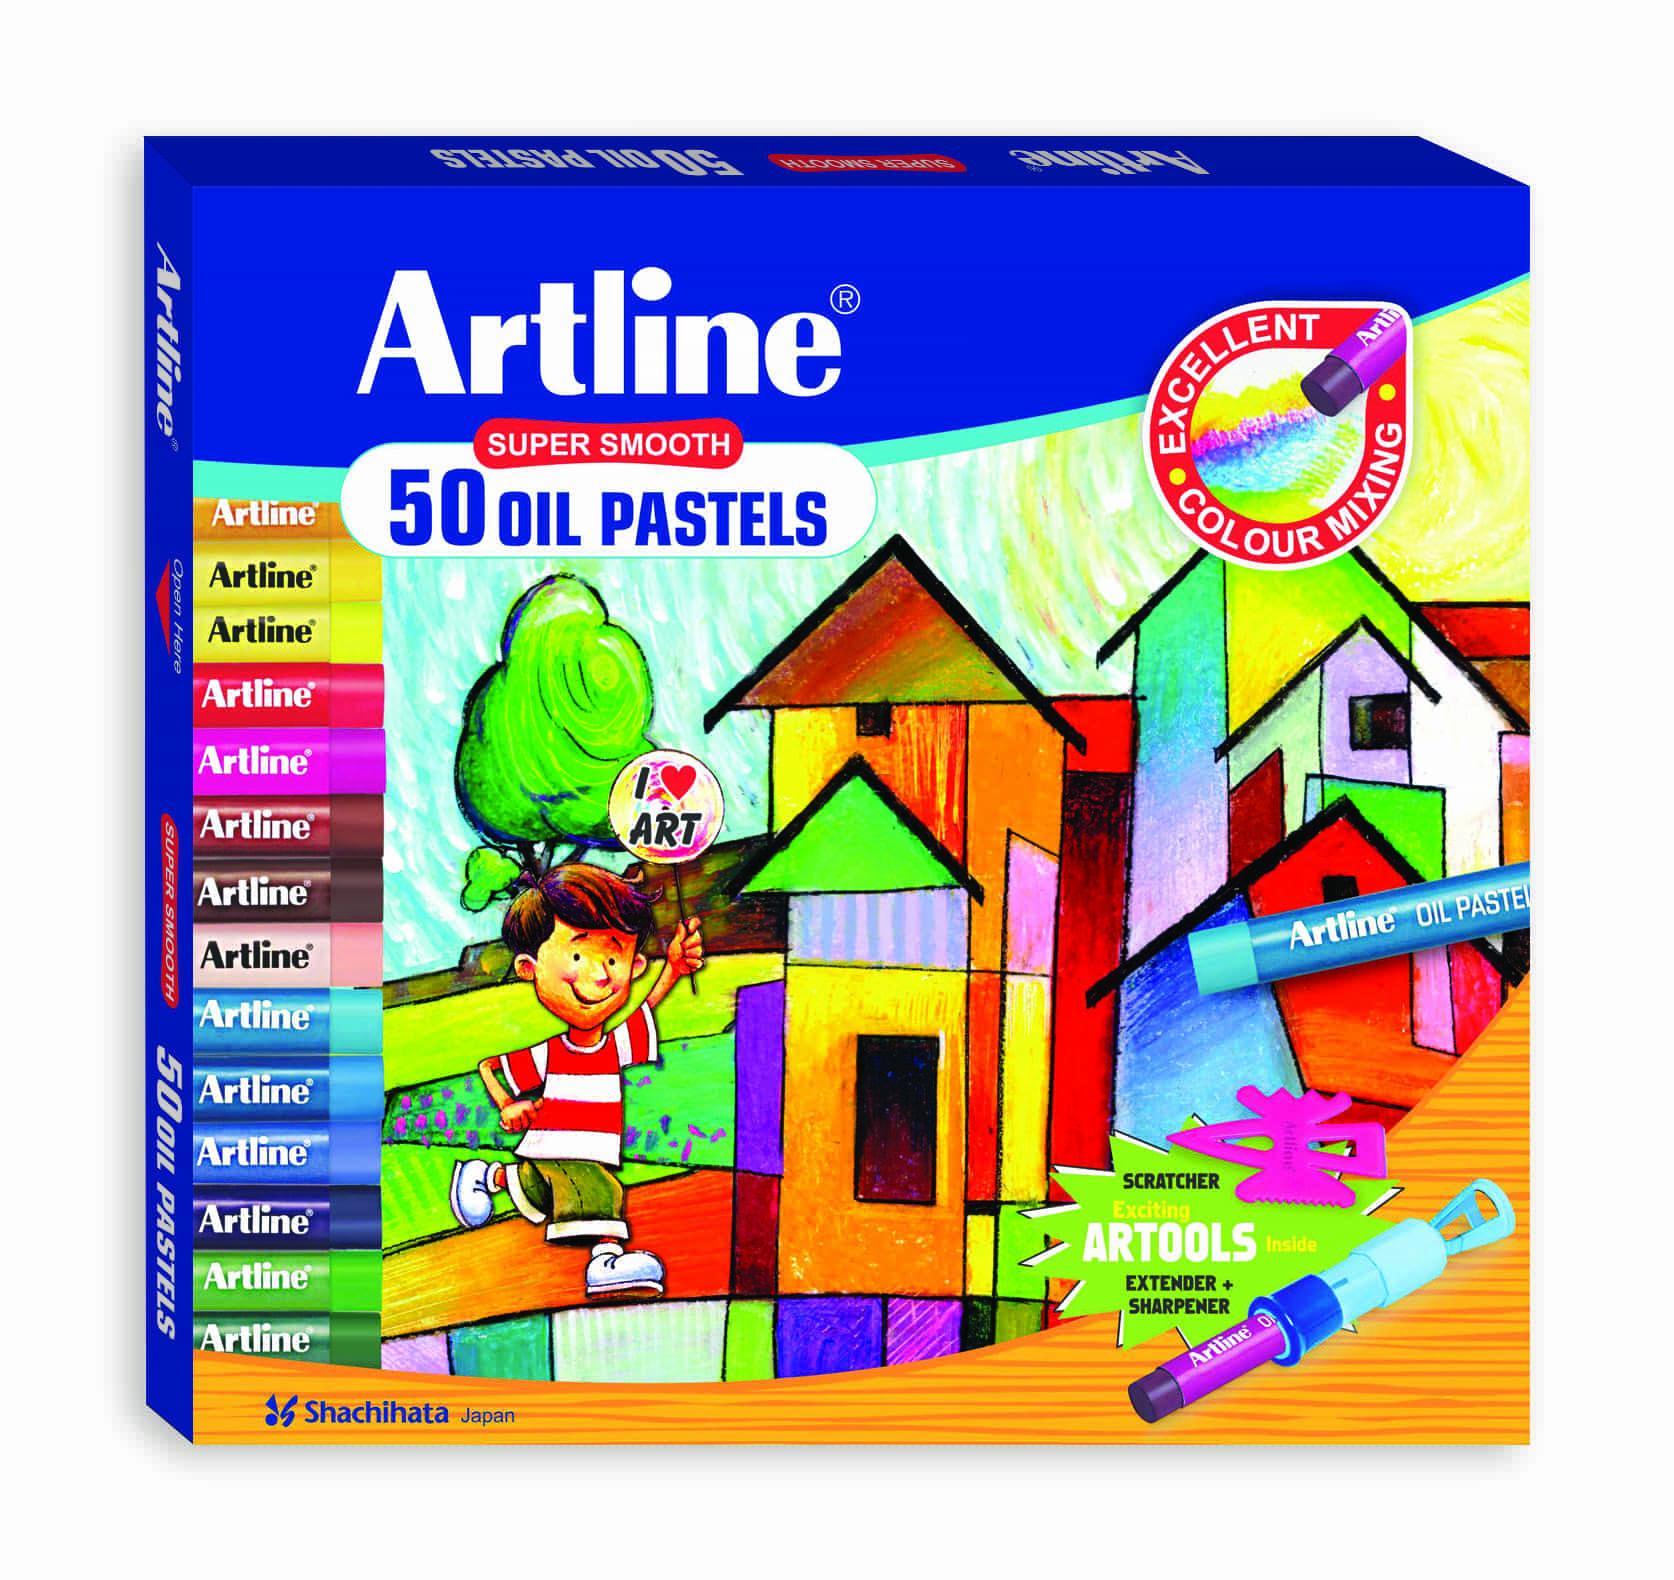 Artline Oil Pastel Colors - 50 Shades